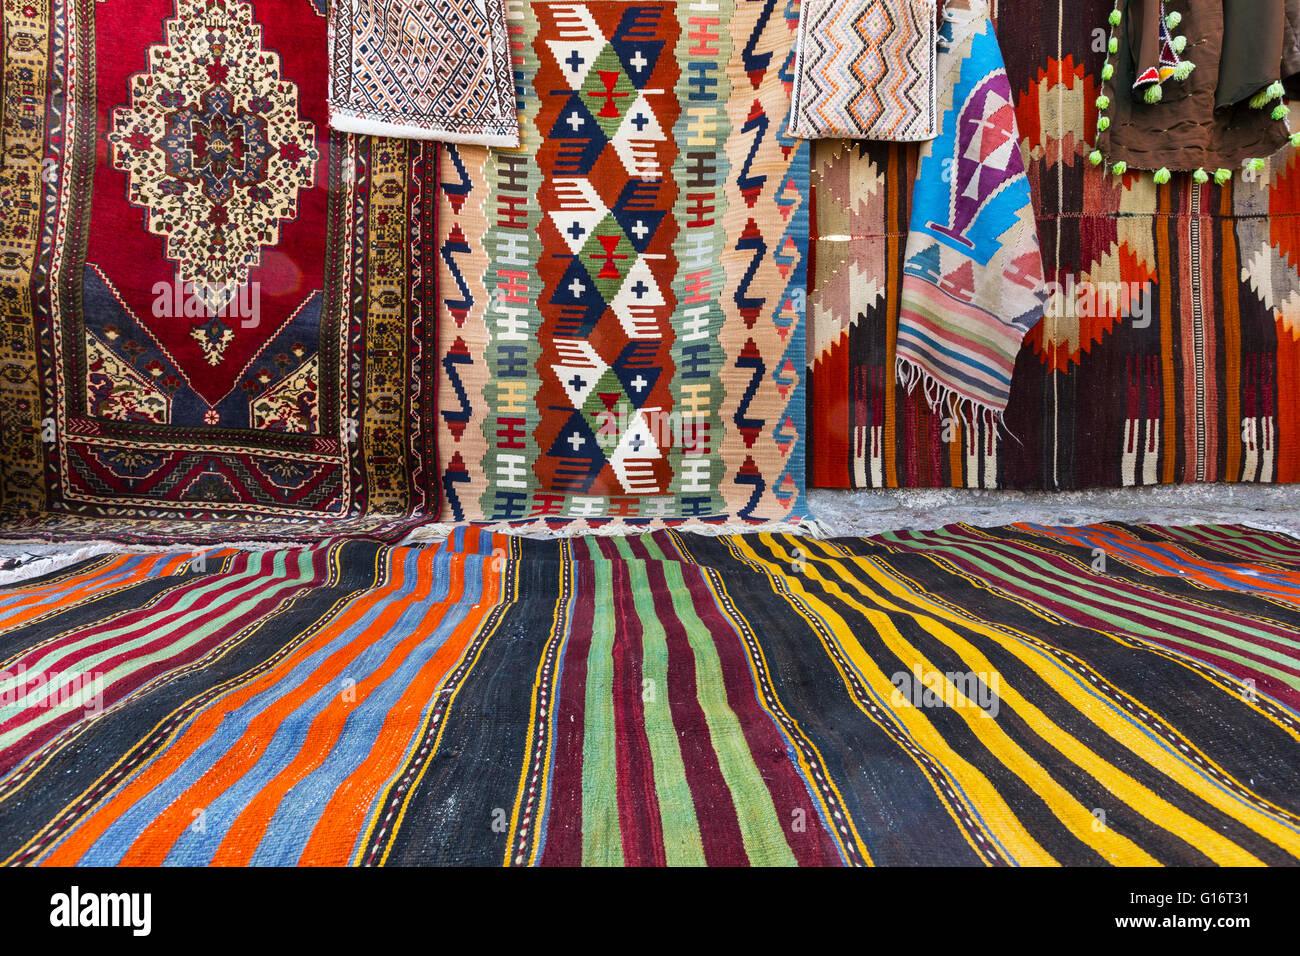 Carpet and Kilim Shop - Stock Image